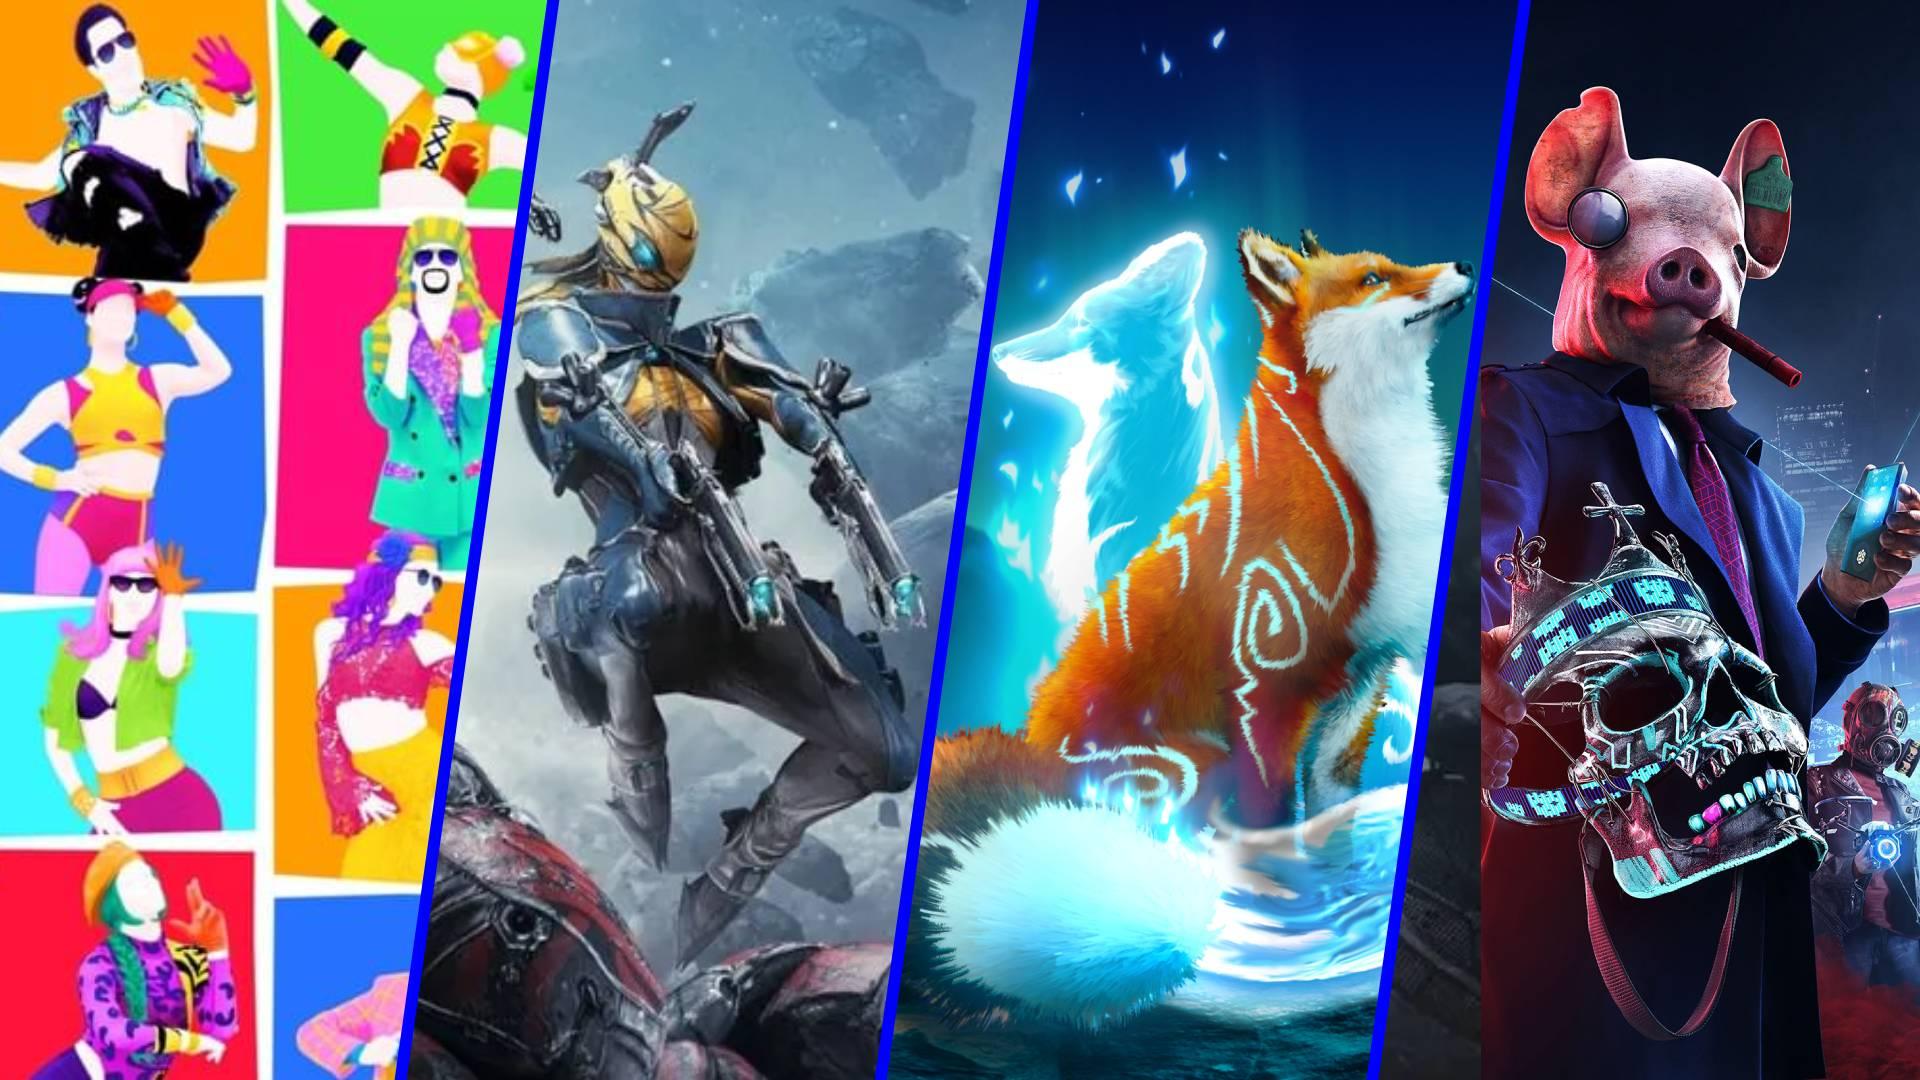 New PS5 Games - PS5 New Releases (November 23 - November 29) - PlayStation Universe